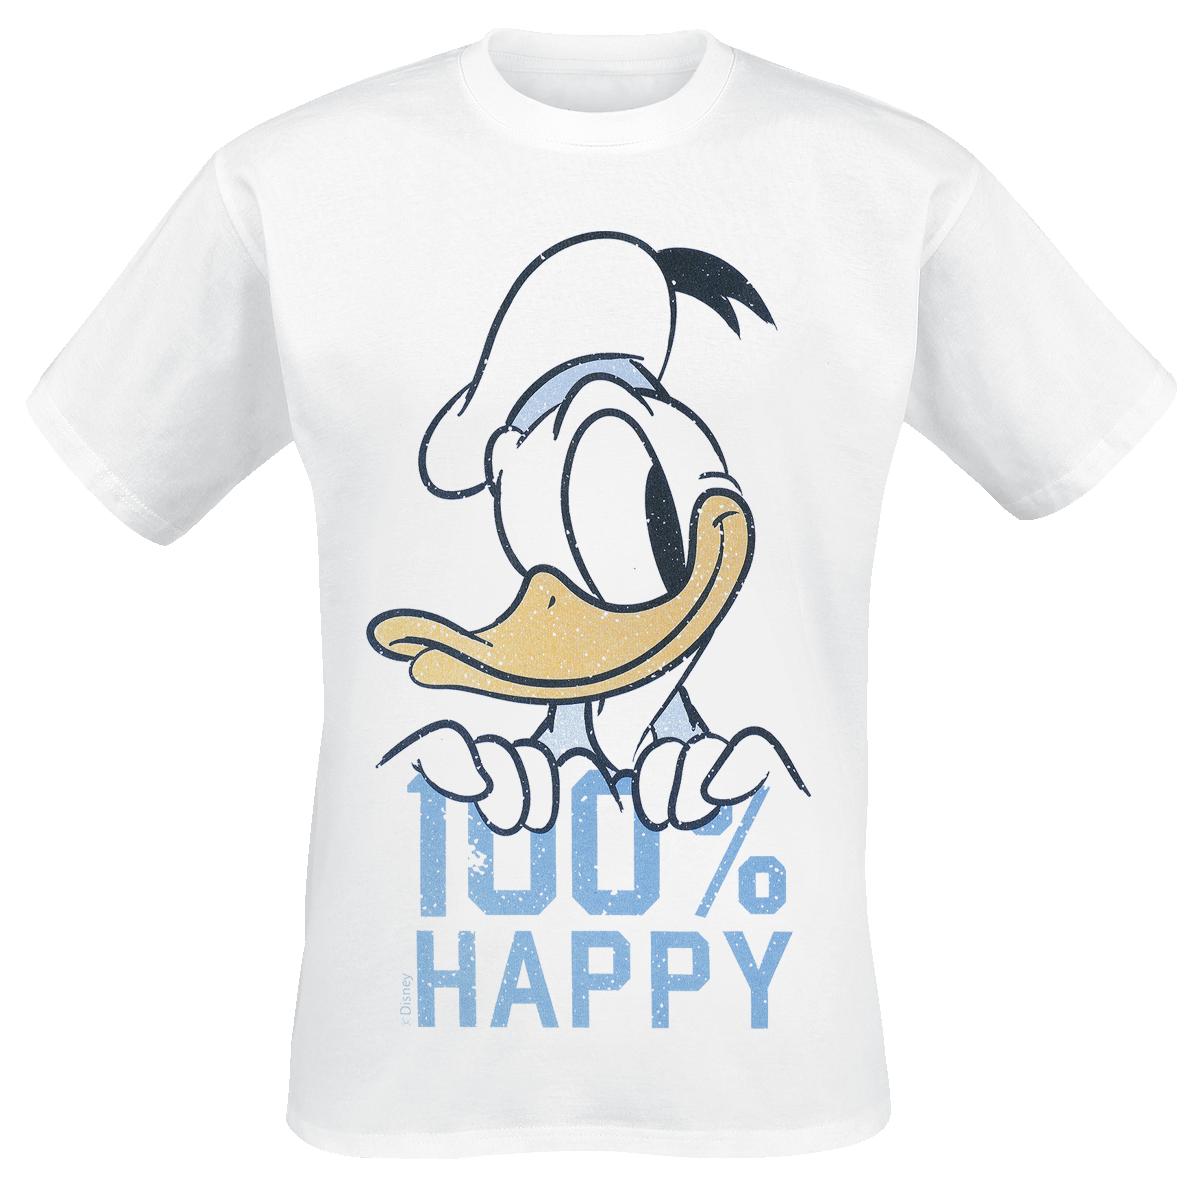 Donald Duck - 100% Happy - T-Shirt - weiß